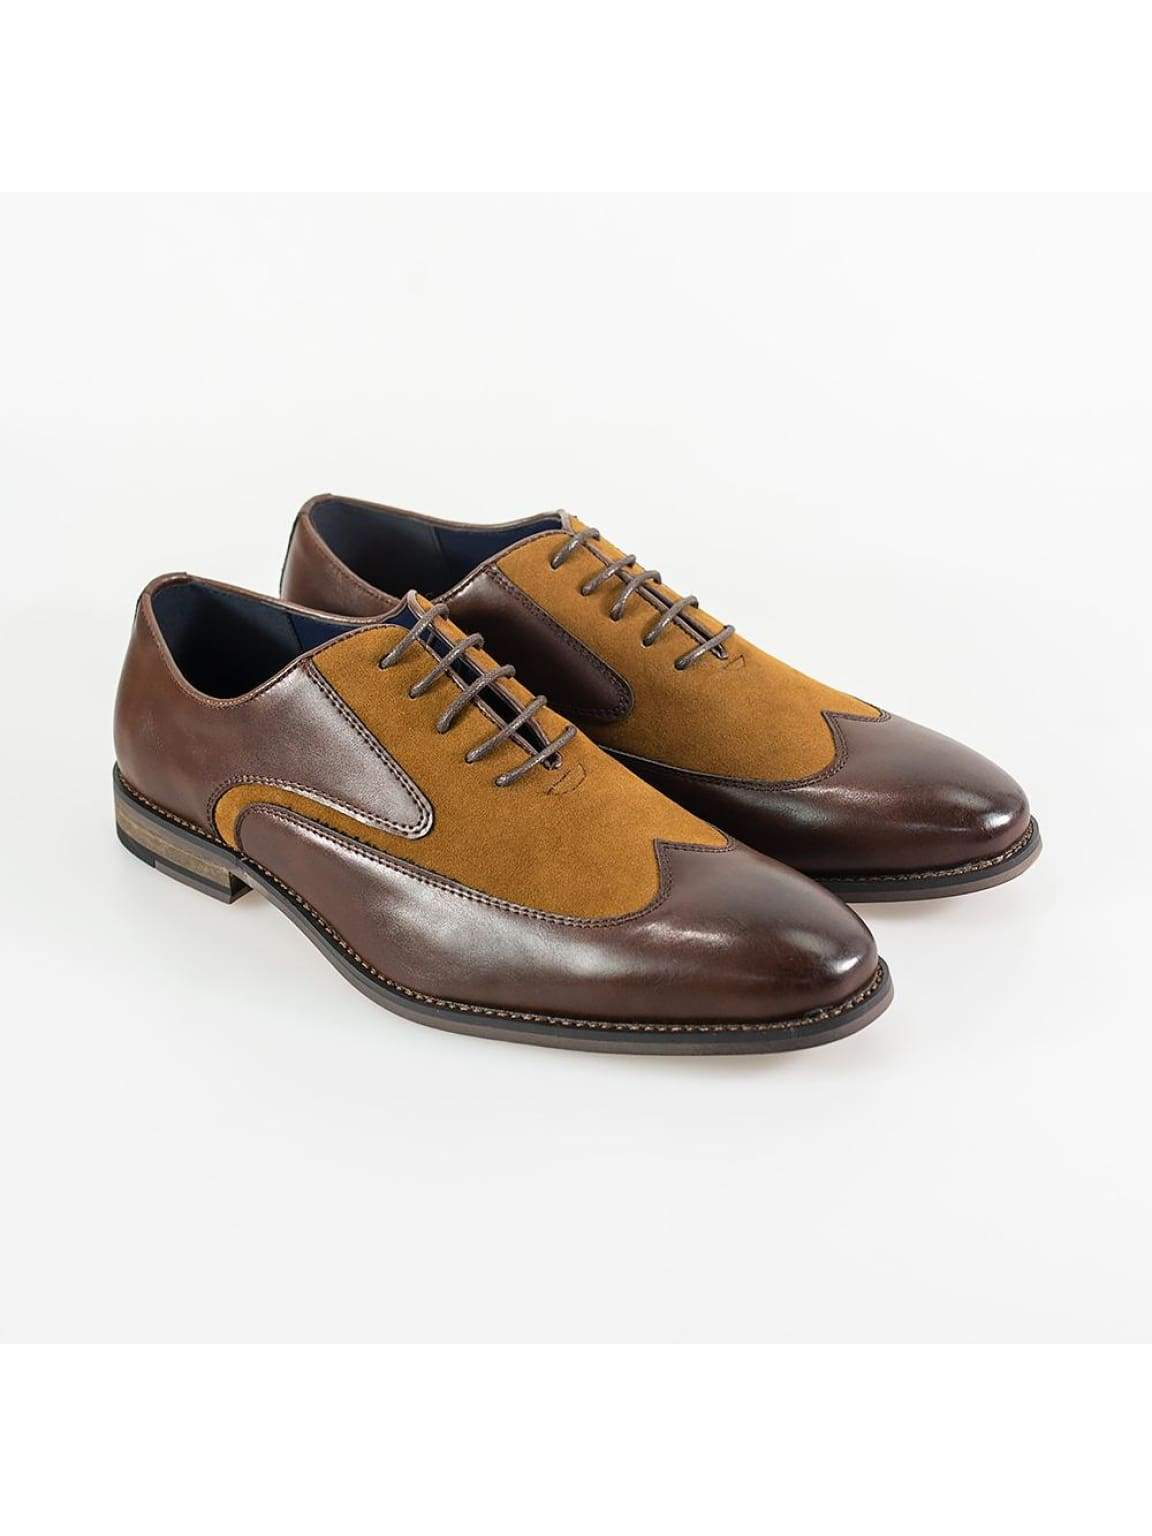 Cavani Tate Brown/Tan Mens Shoe - UK7 | EU41 - Shoes